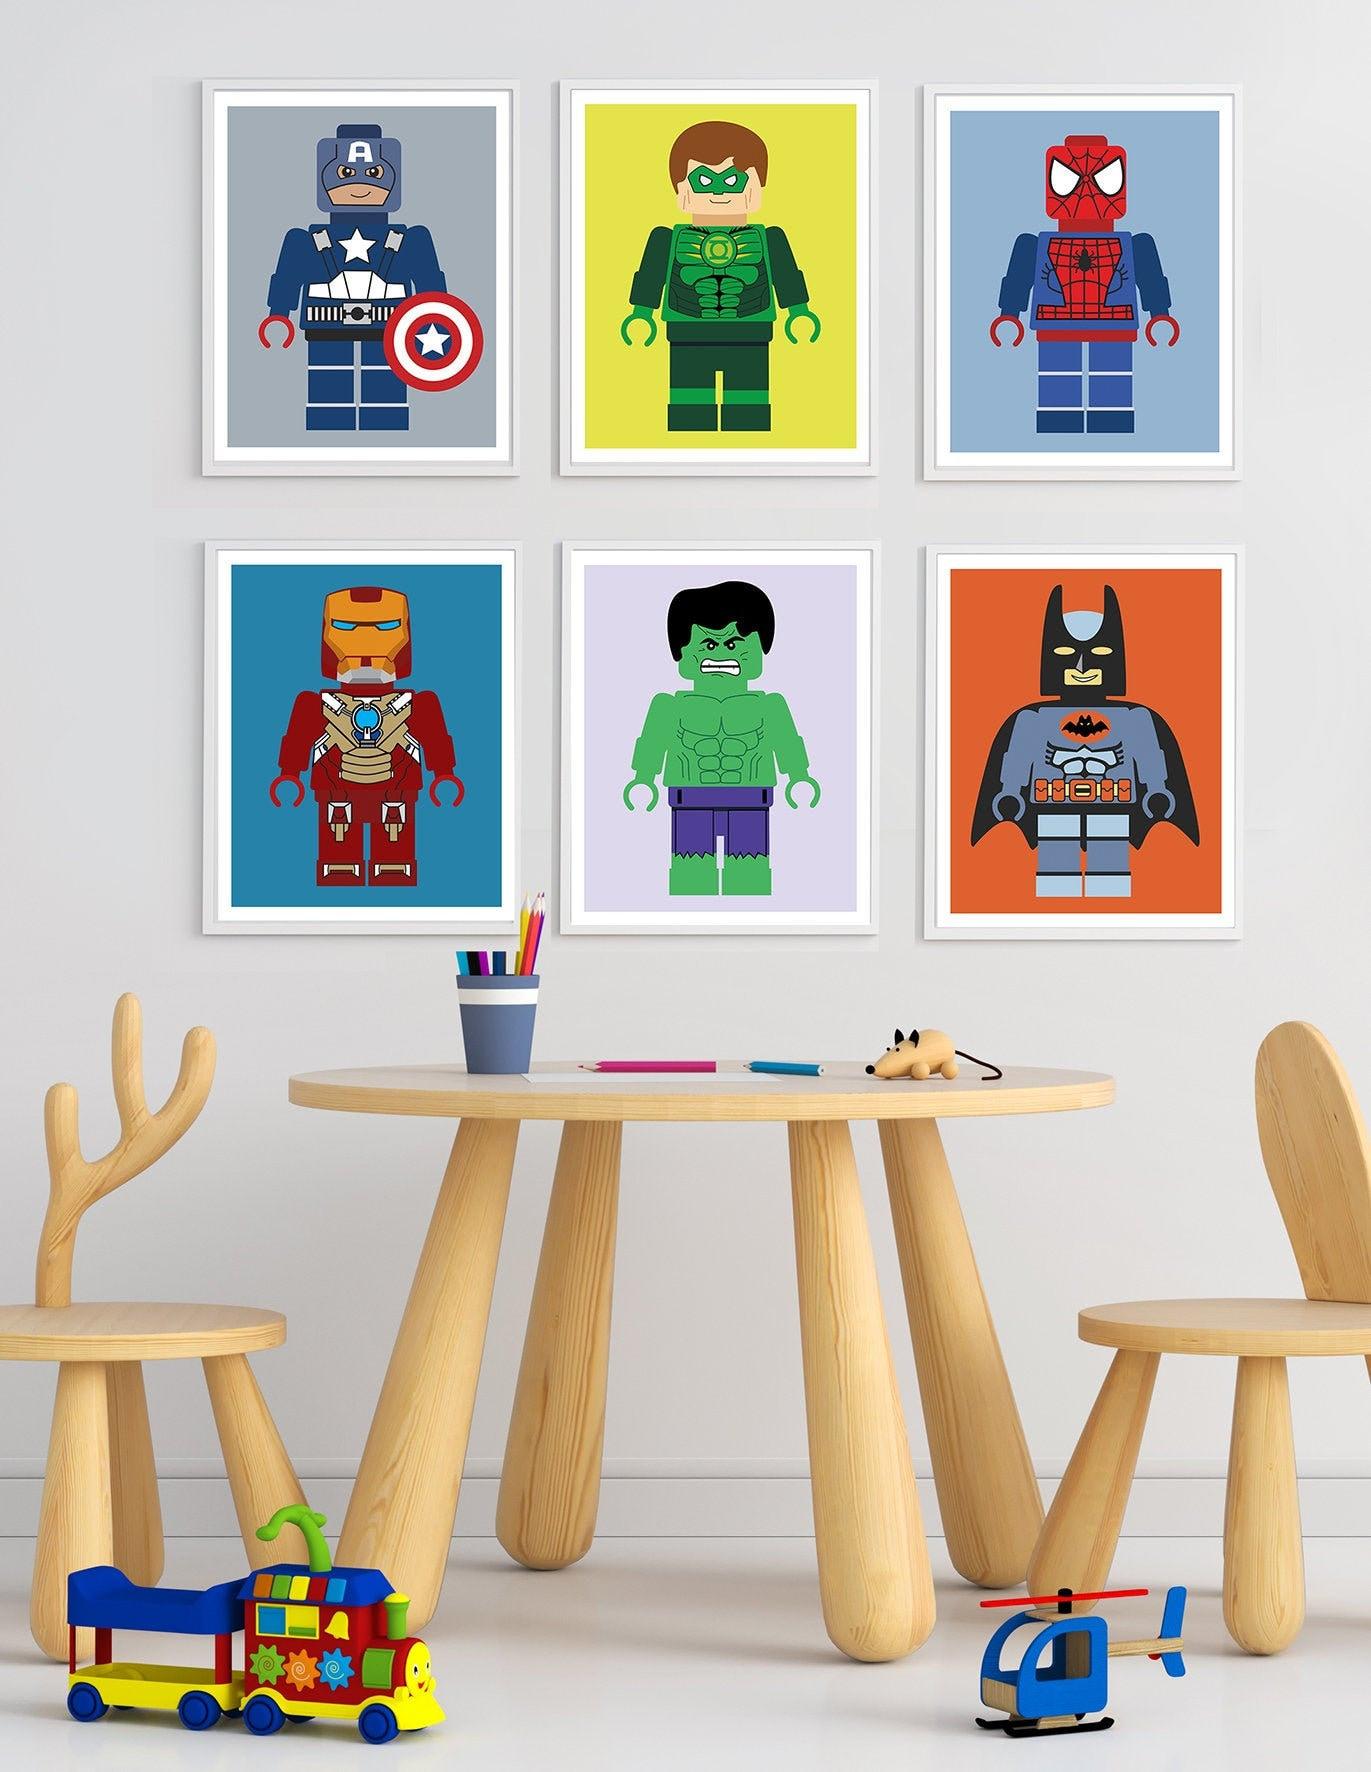 Superhero Prints, Printable Wall Art, Superhero Wall Art, Superhero Decor,  Superhero Wall Decor, Superhero Printables, Set of 6 Prints